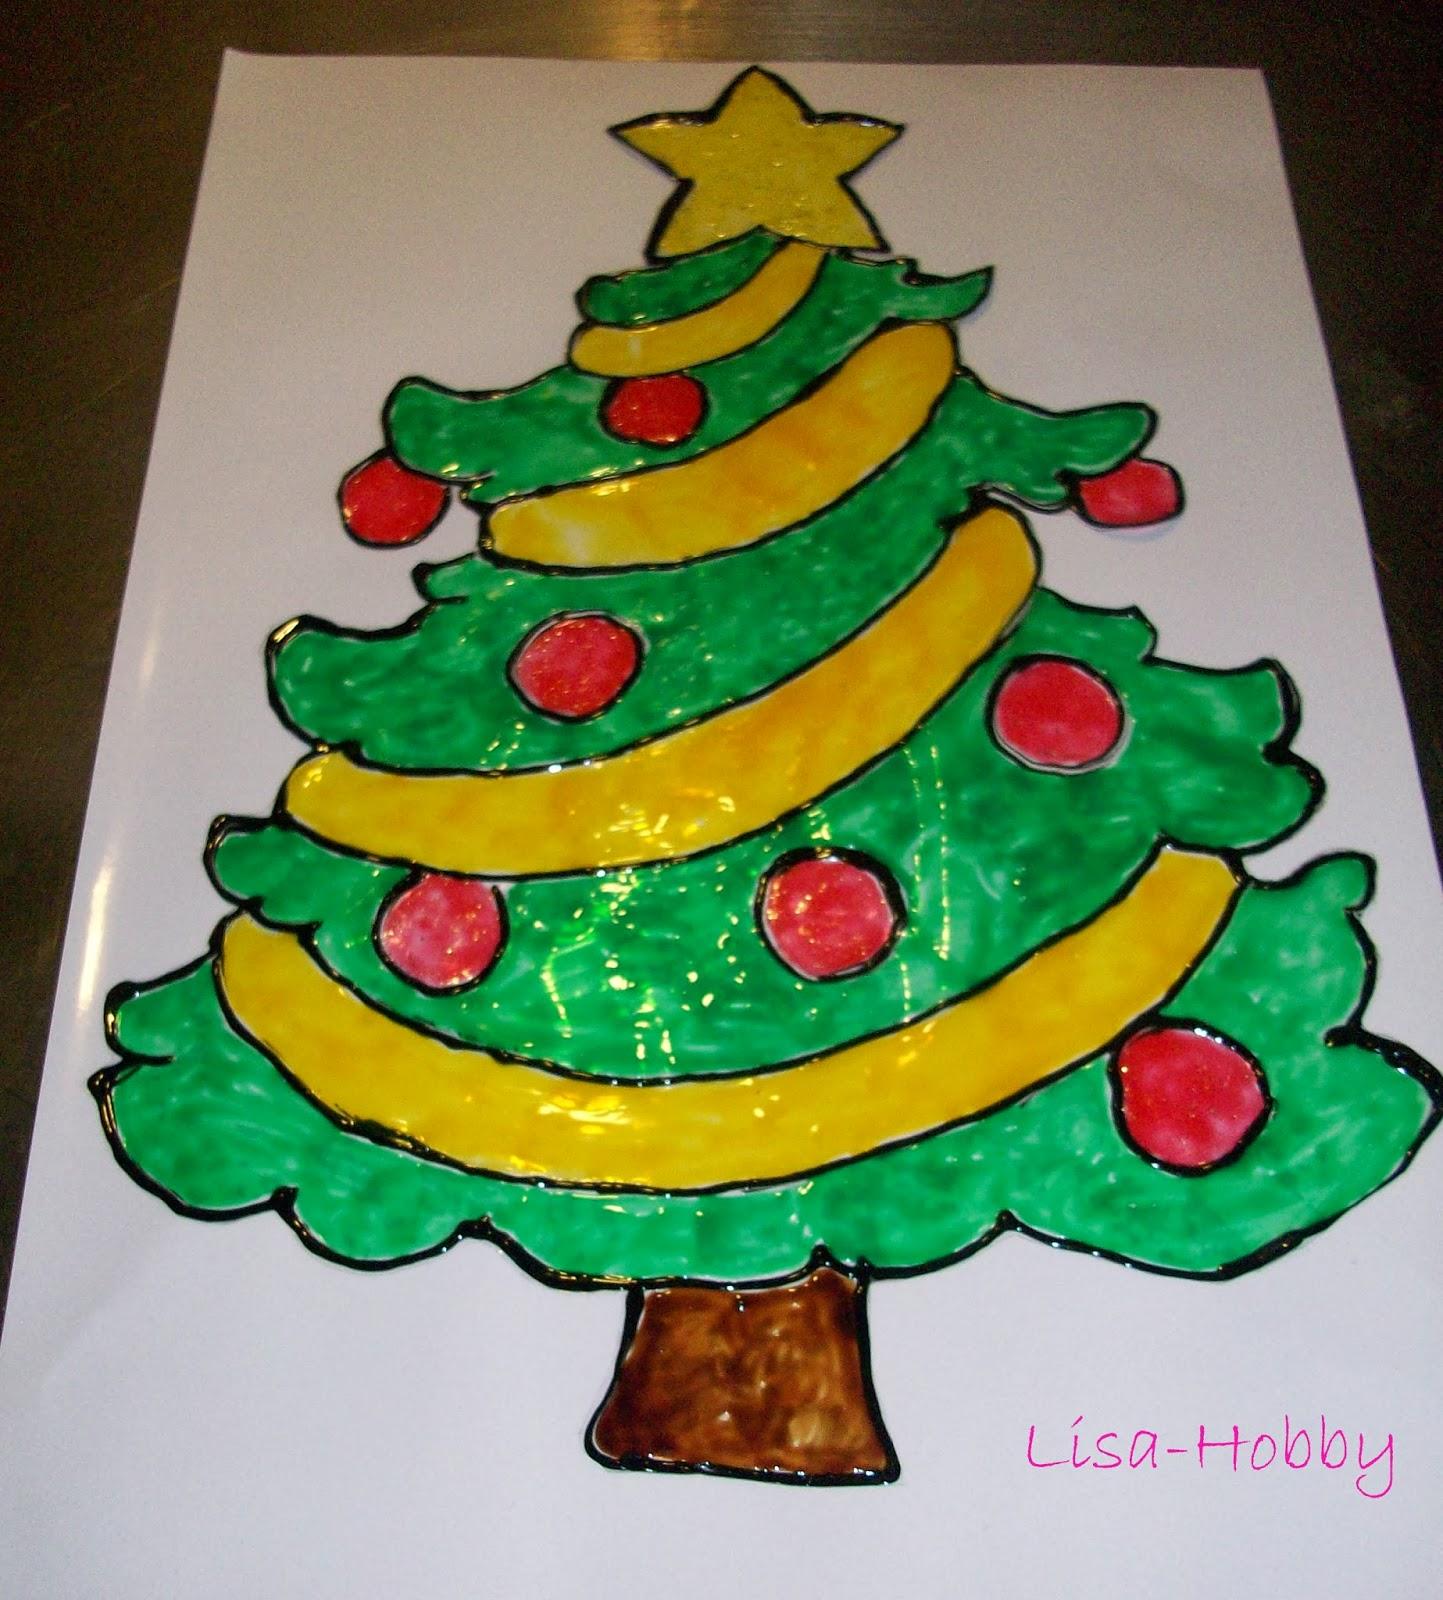 Lisa hobby decorazioni natalizie per finestre - Decorazioni natalizie per finestre ...